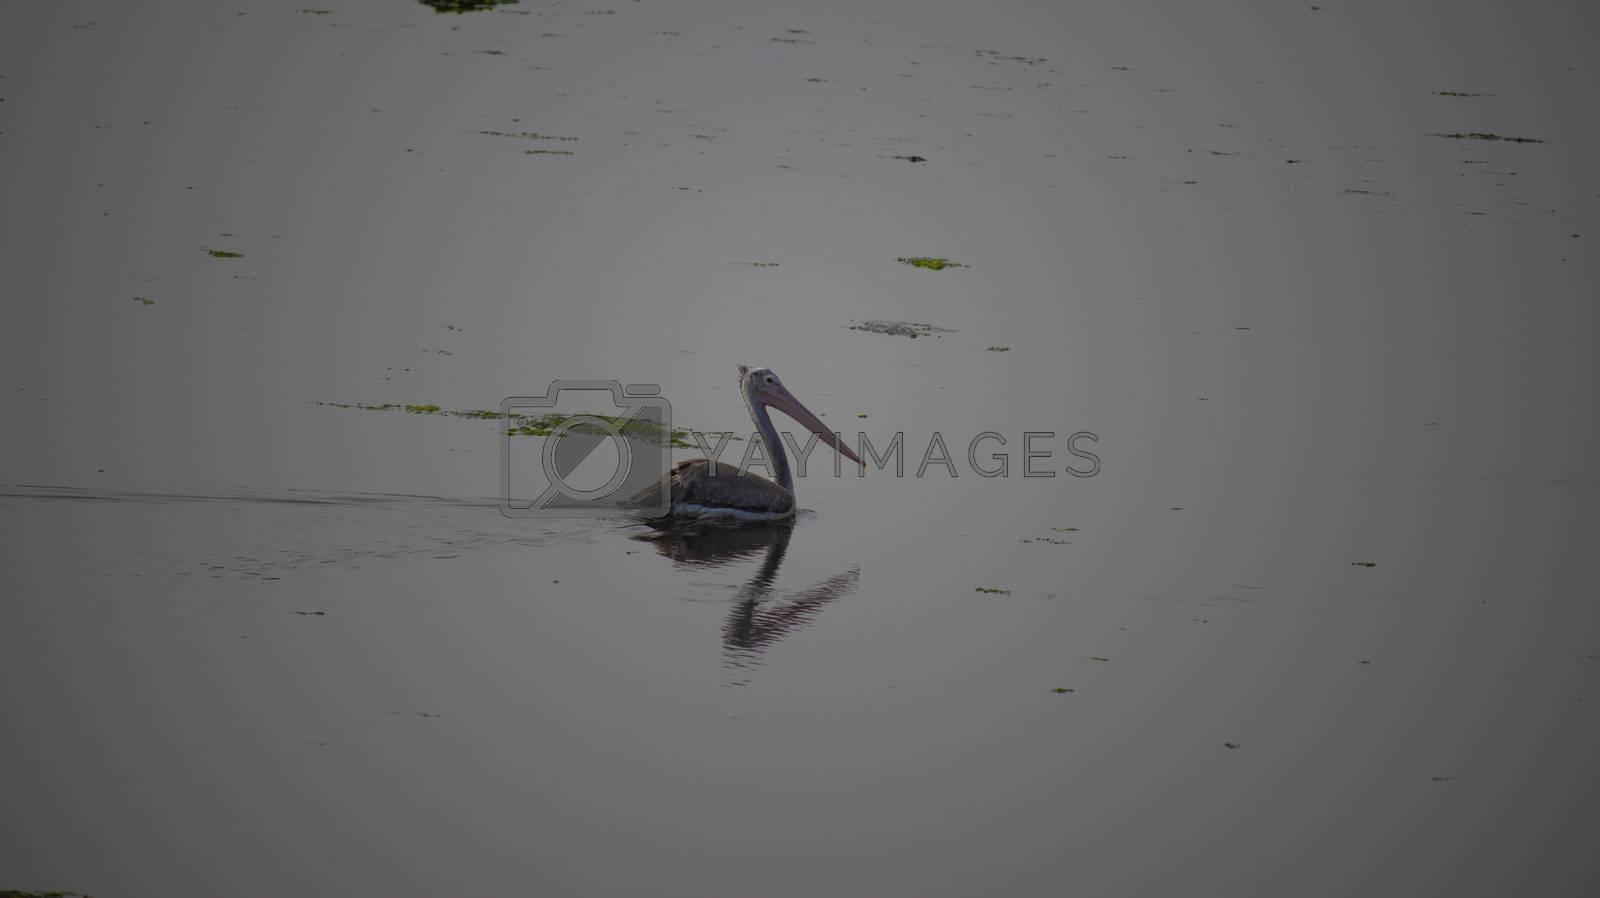 A Peruvian pelican bird swimming in a pond in Chennai city of india